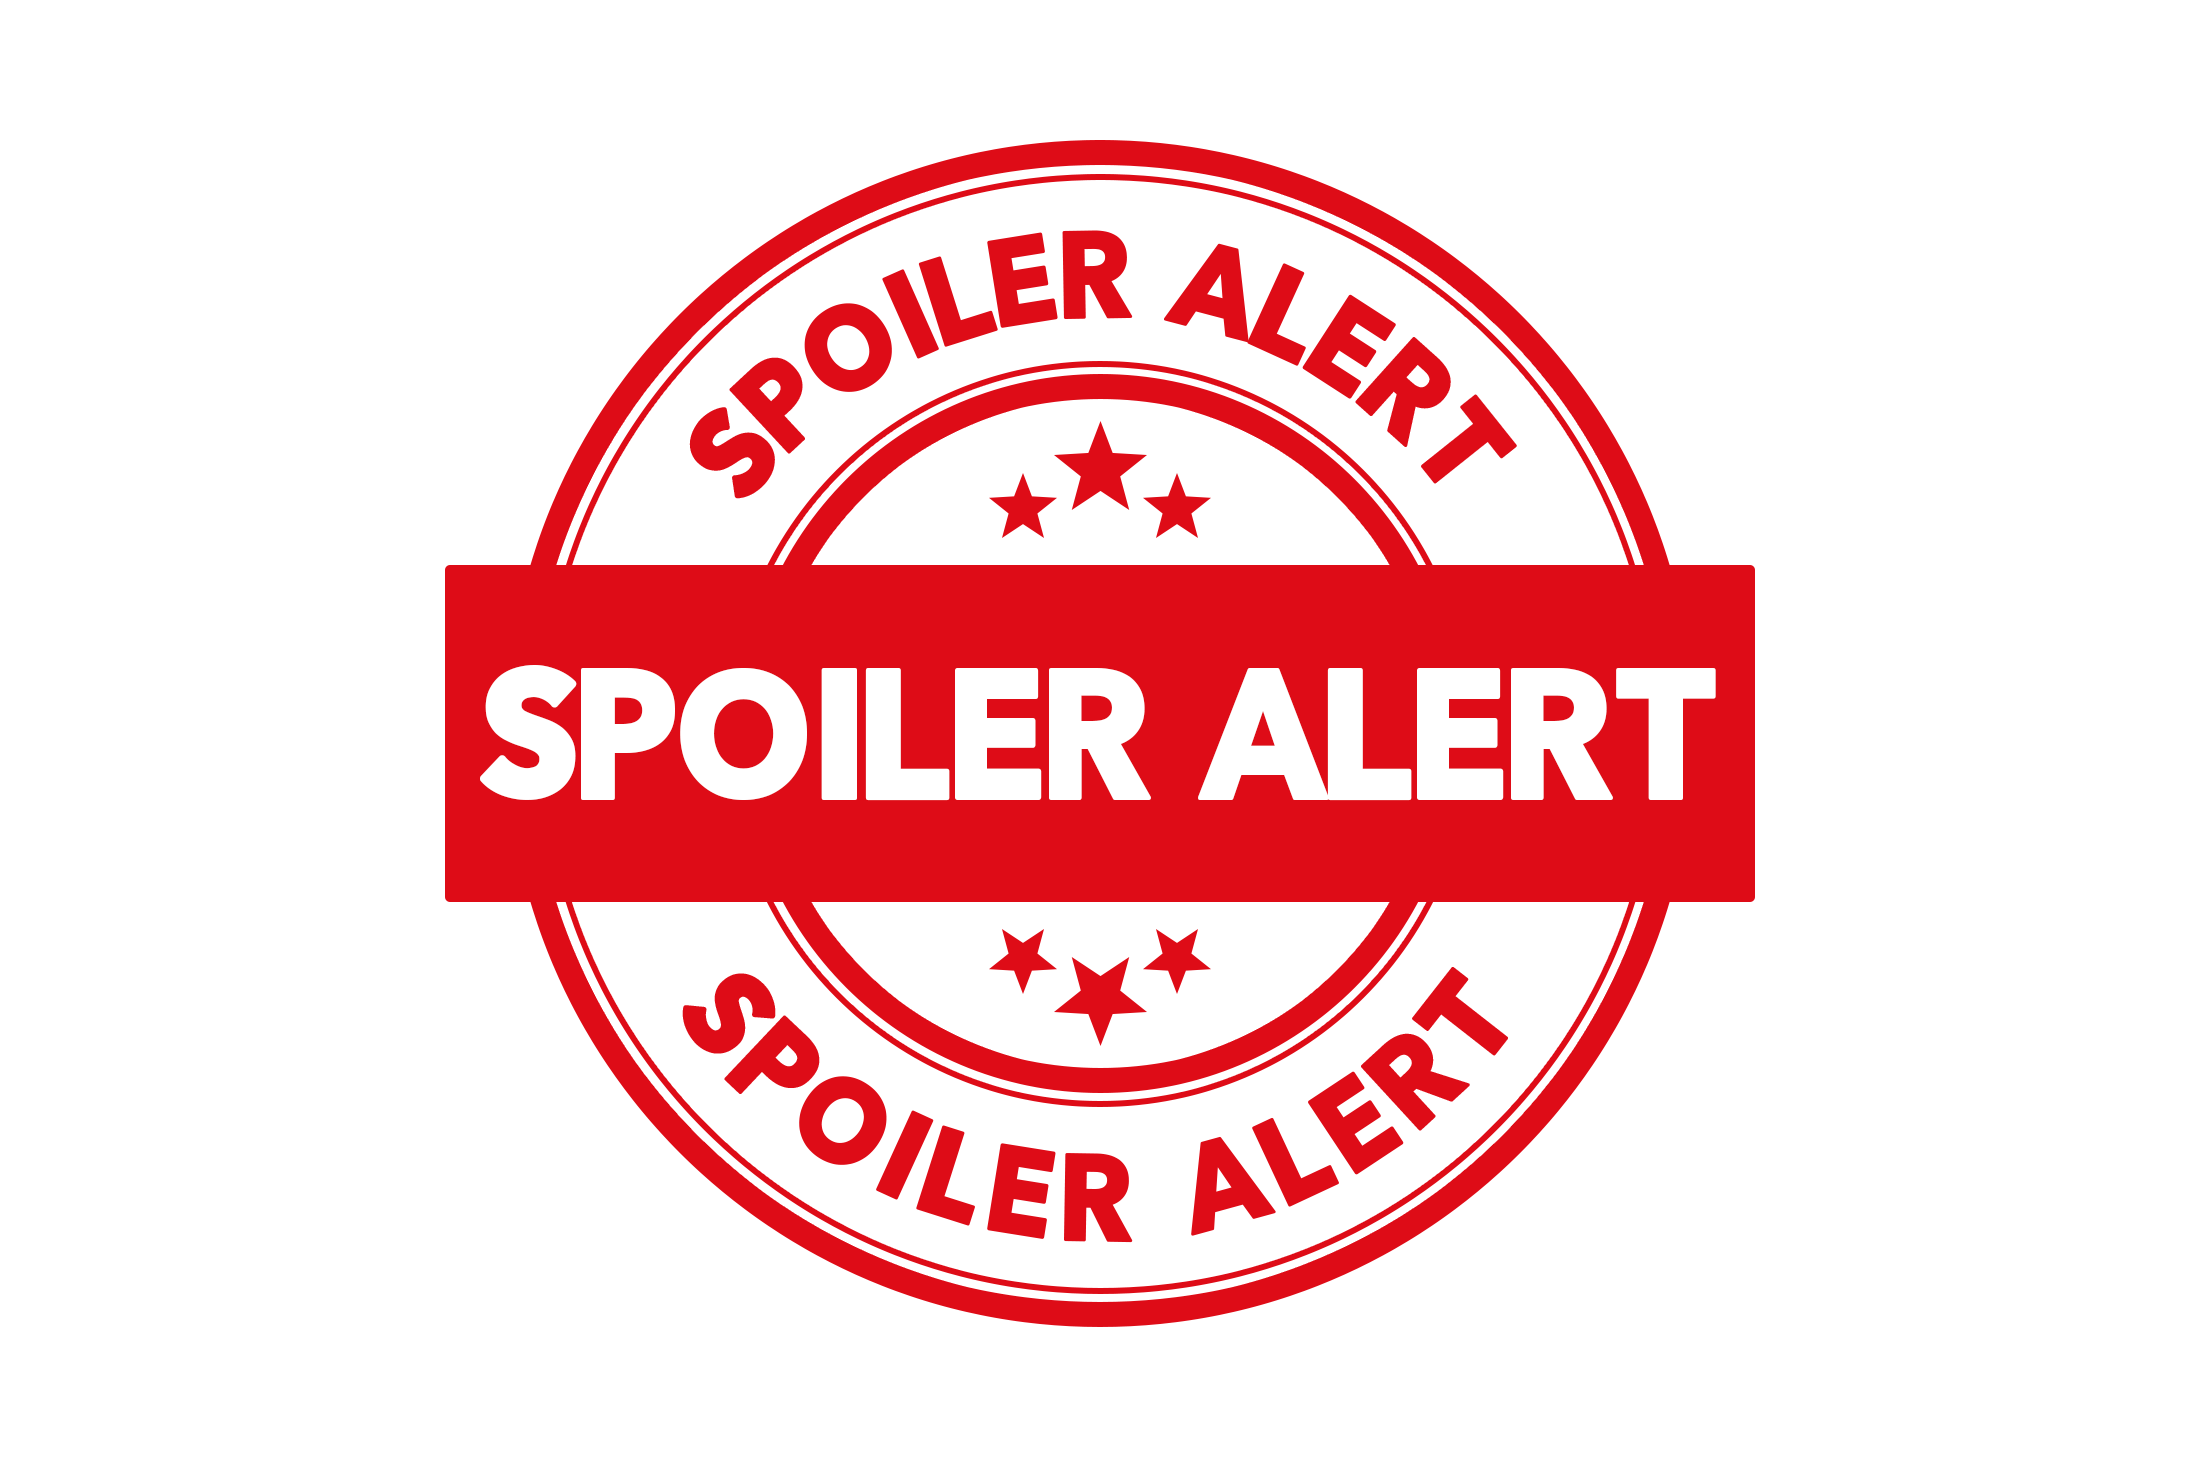 Round spoiler alert stamp PSD